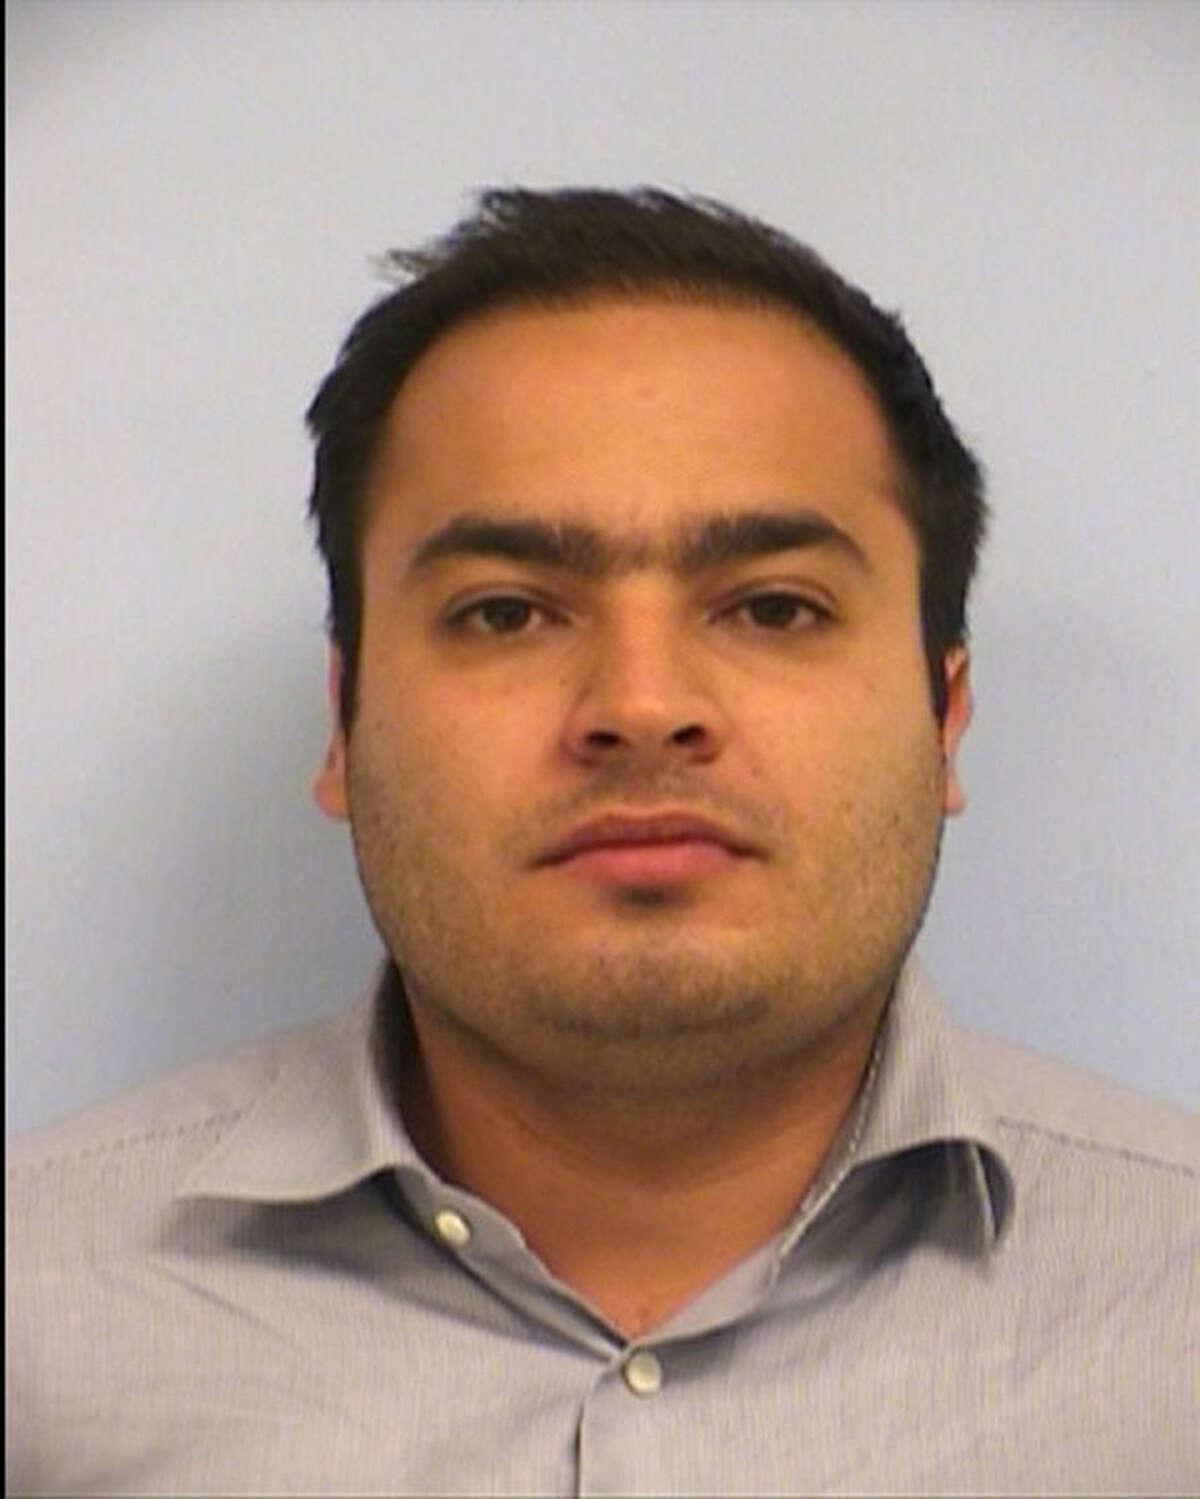 Francisco Colorado Cebado, the son of Veracruz businessman Francisco Colorado Cessa, was sentenced to a year in prison for conspiring to bribe a federal judge.